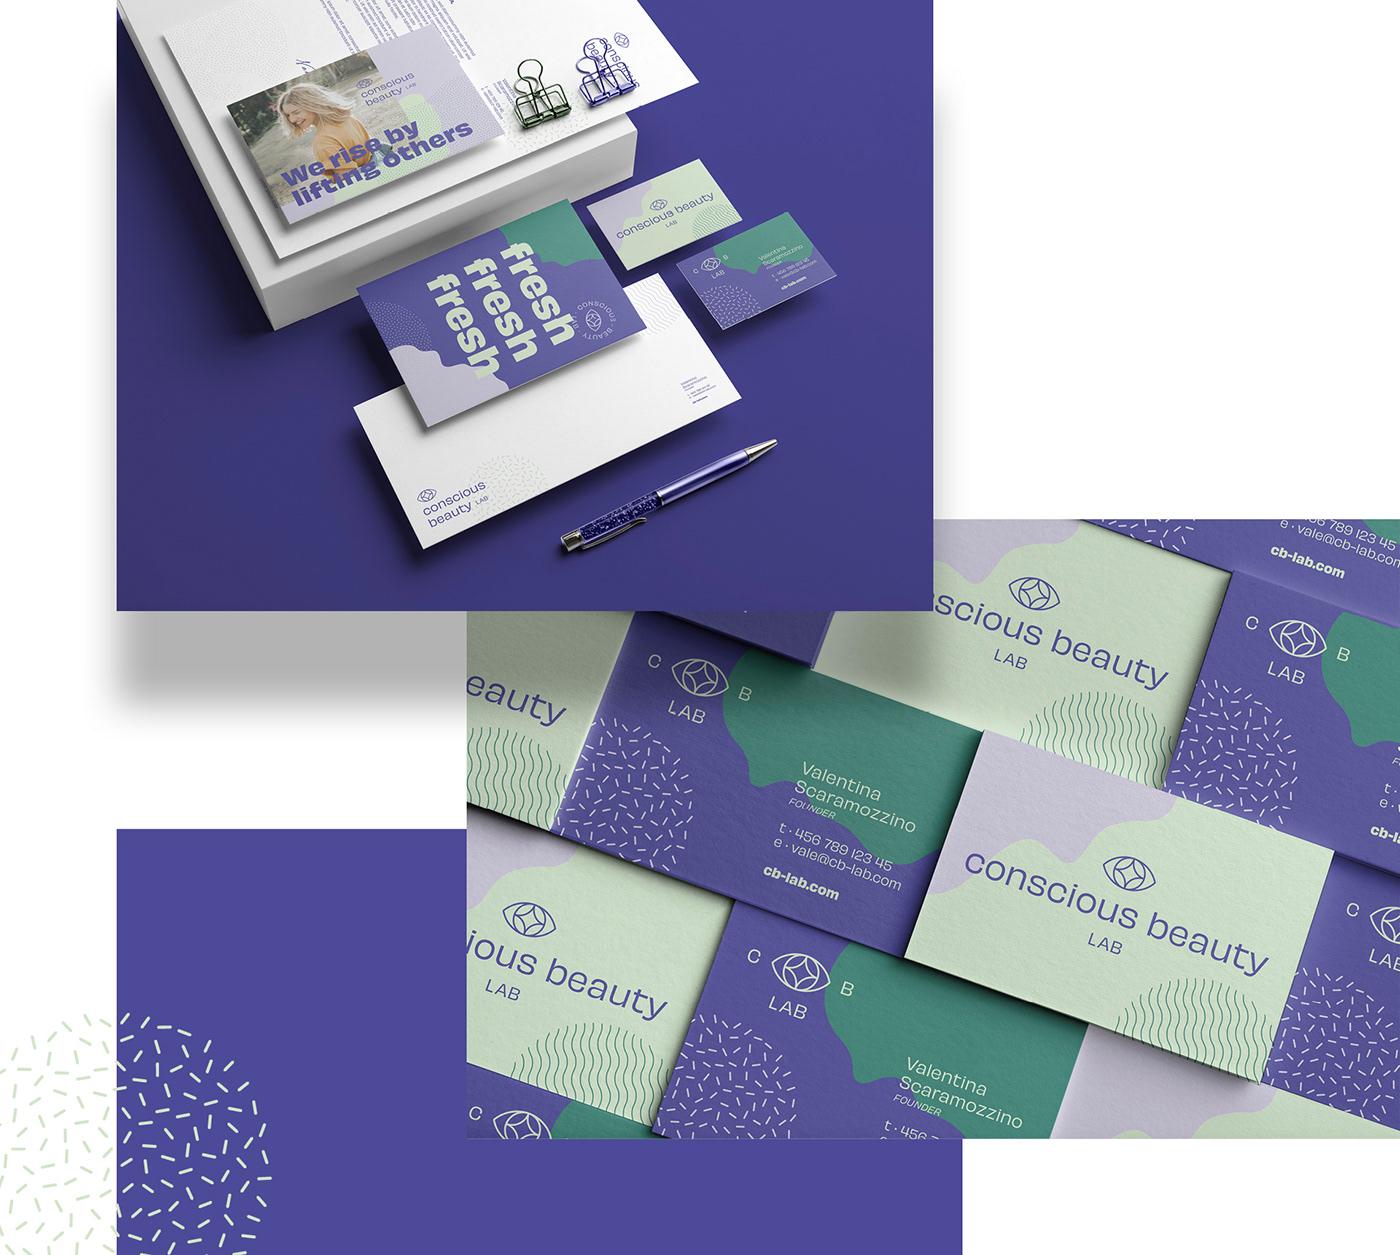 beauty branding  color palette conscious fresh identity lab Logo Design natural social media